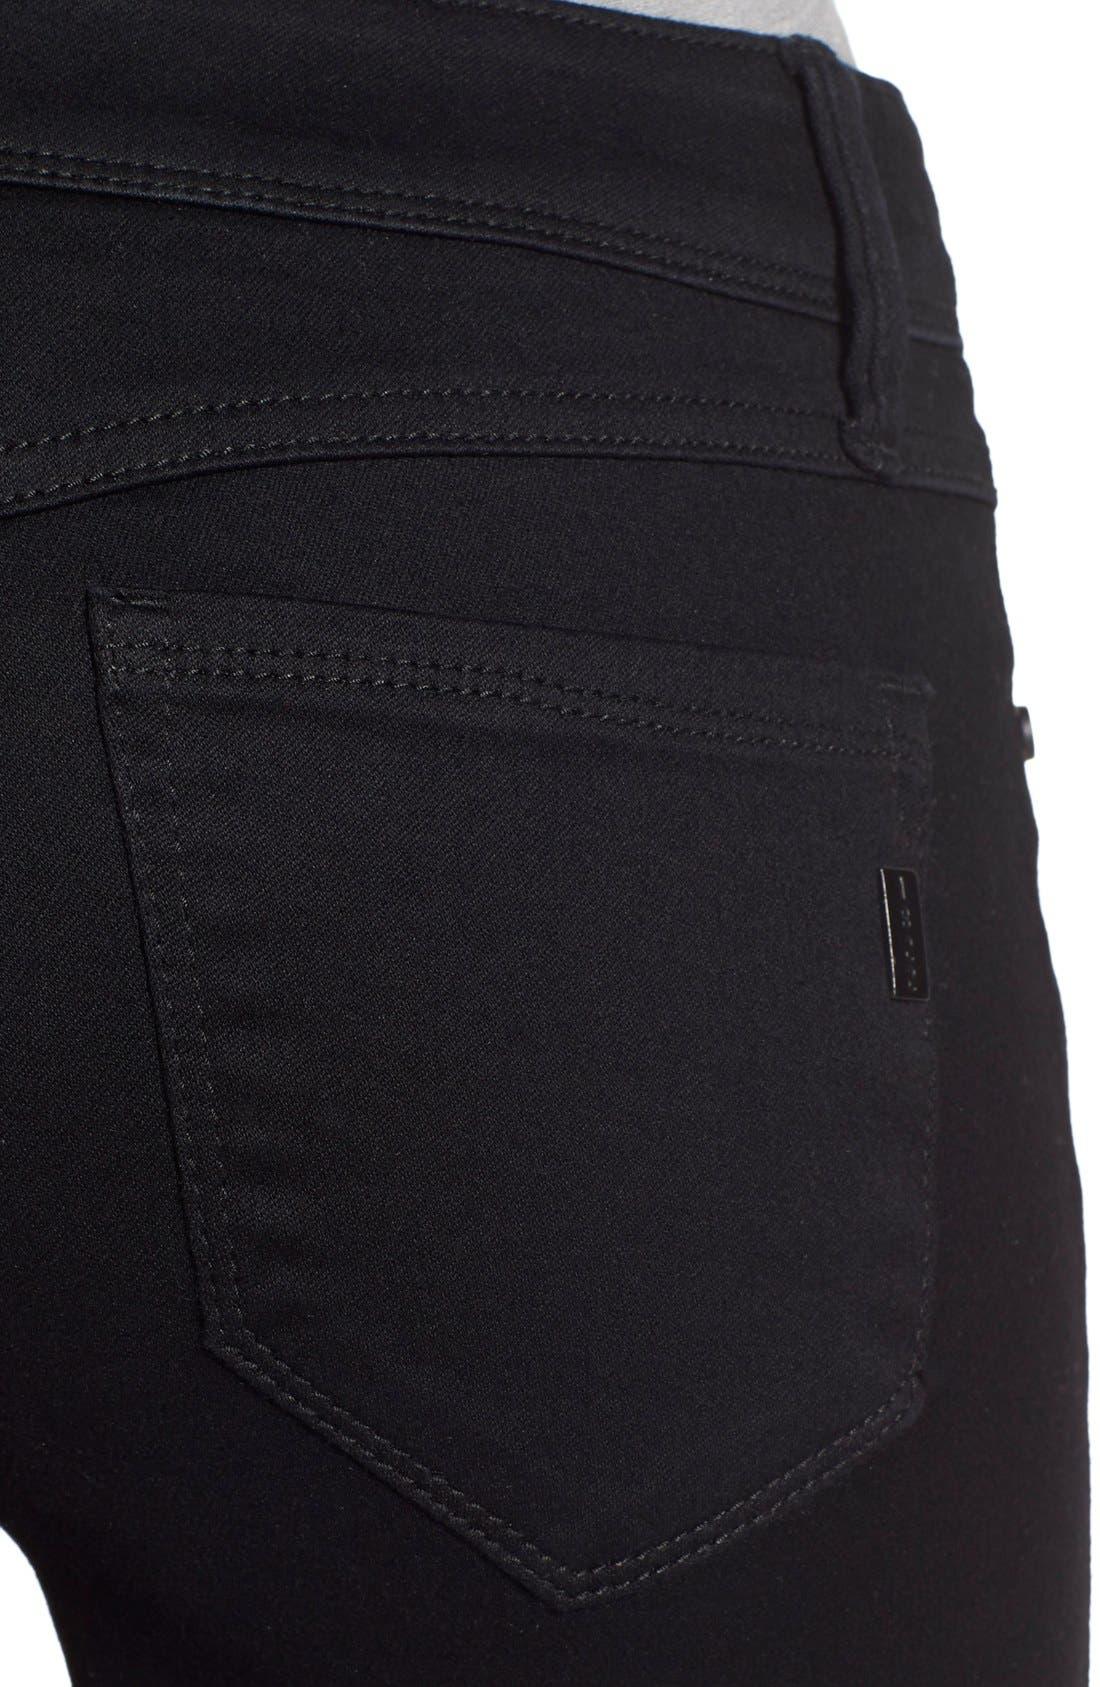 Butter Skinny Jeans,                             Alternate thumbnail 3, color,                             BLACK